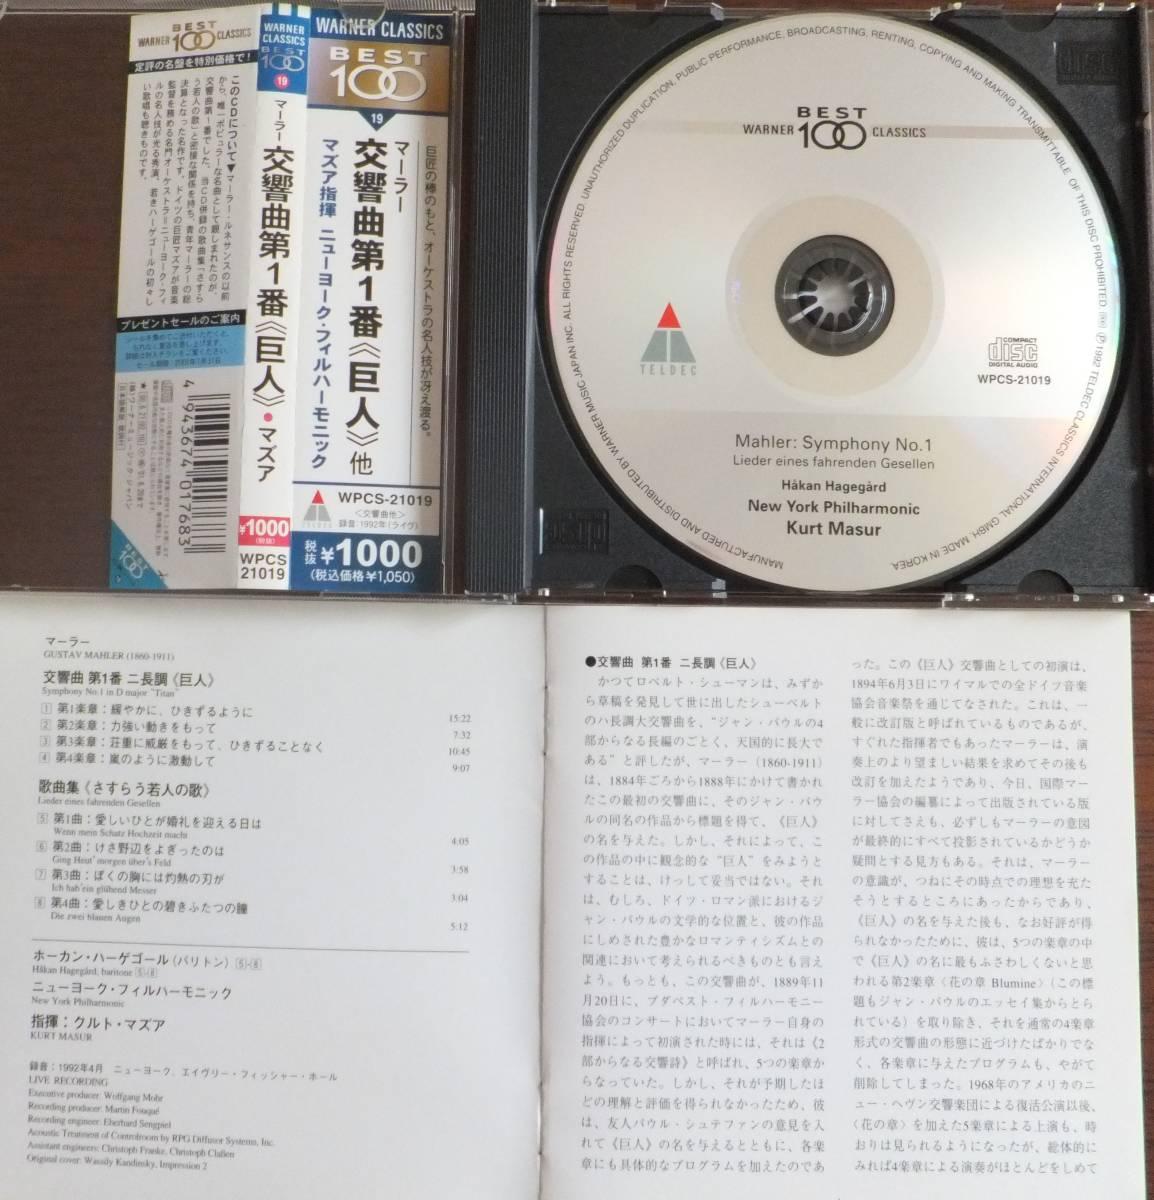 CD マーラー 交響曲第1番「巨人」/歌曲集「さすらう若人の歌」クルト・アズマ指揮 ニューヨーク・フィルハーモニー管弦楽団_画像4